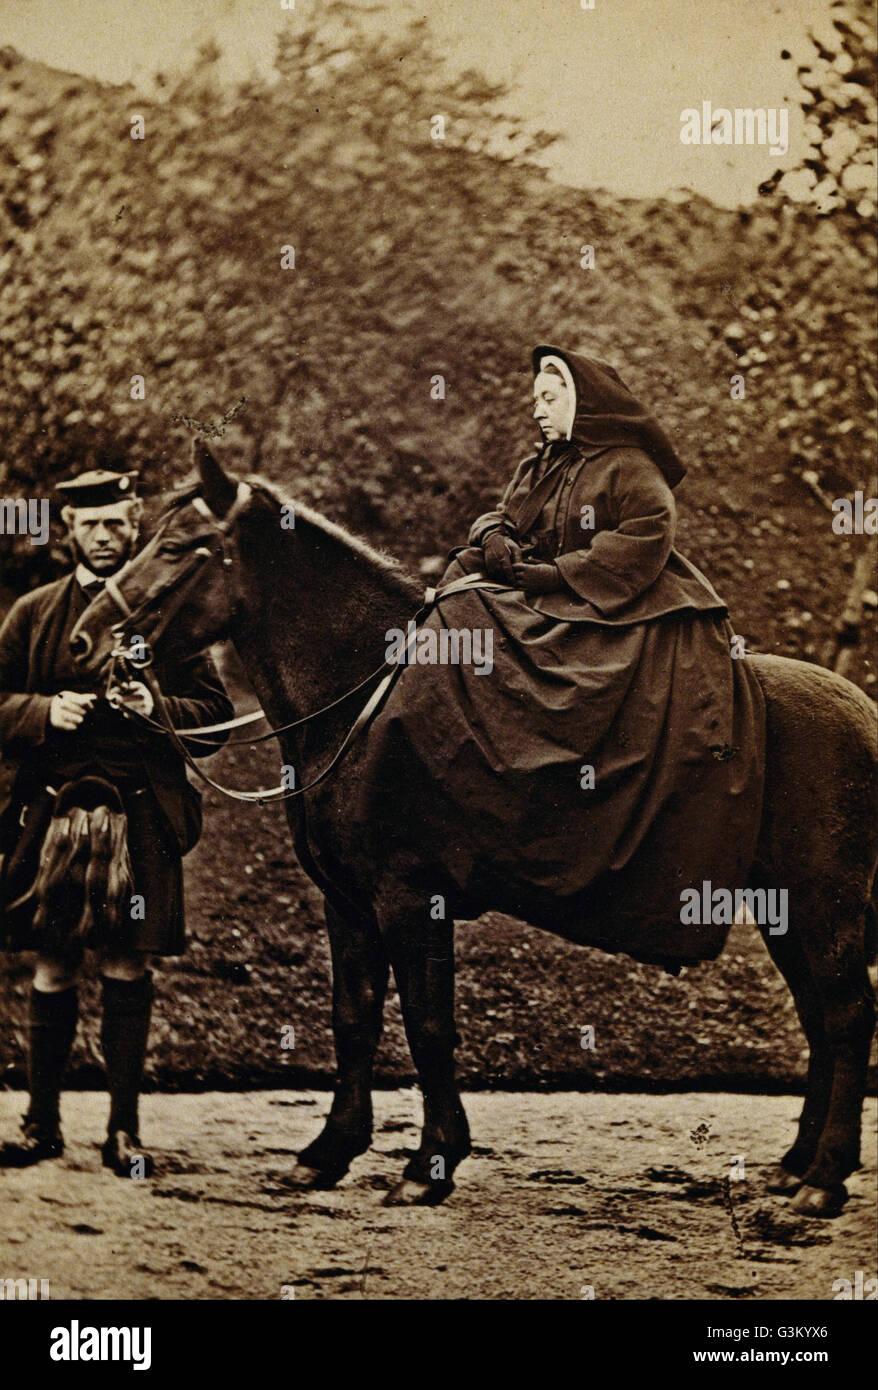 George Washington Wilson - La reine Victoria le 'Fyvie' avec John Brown à Balmoral - Photo Stock